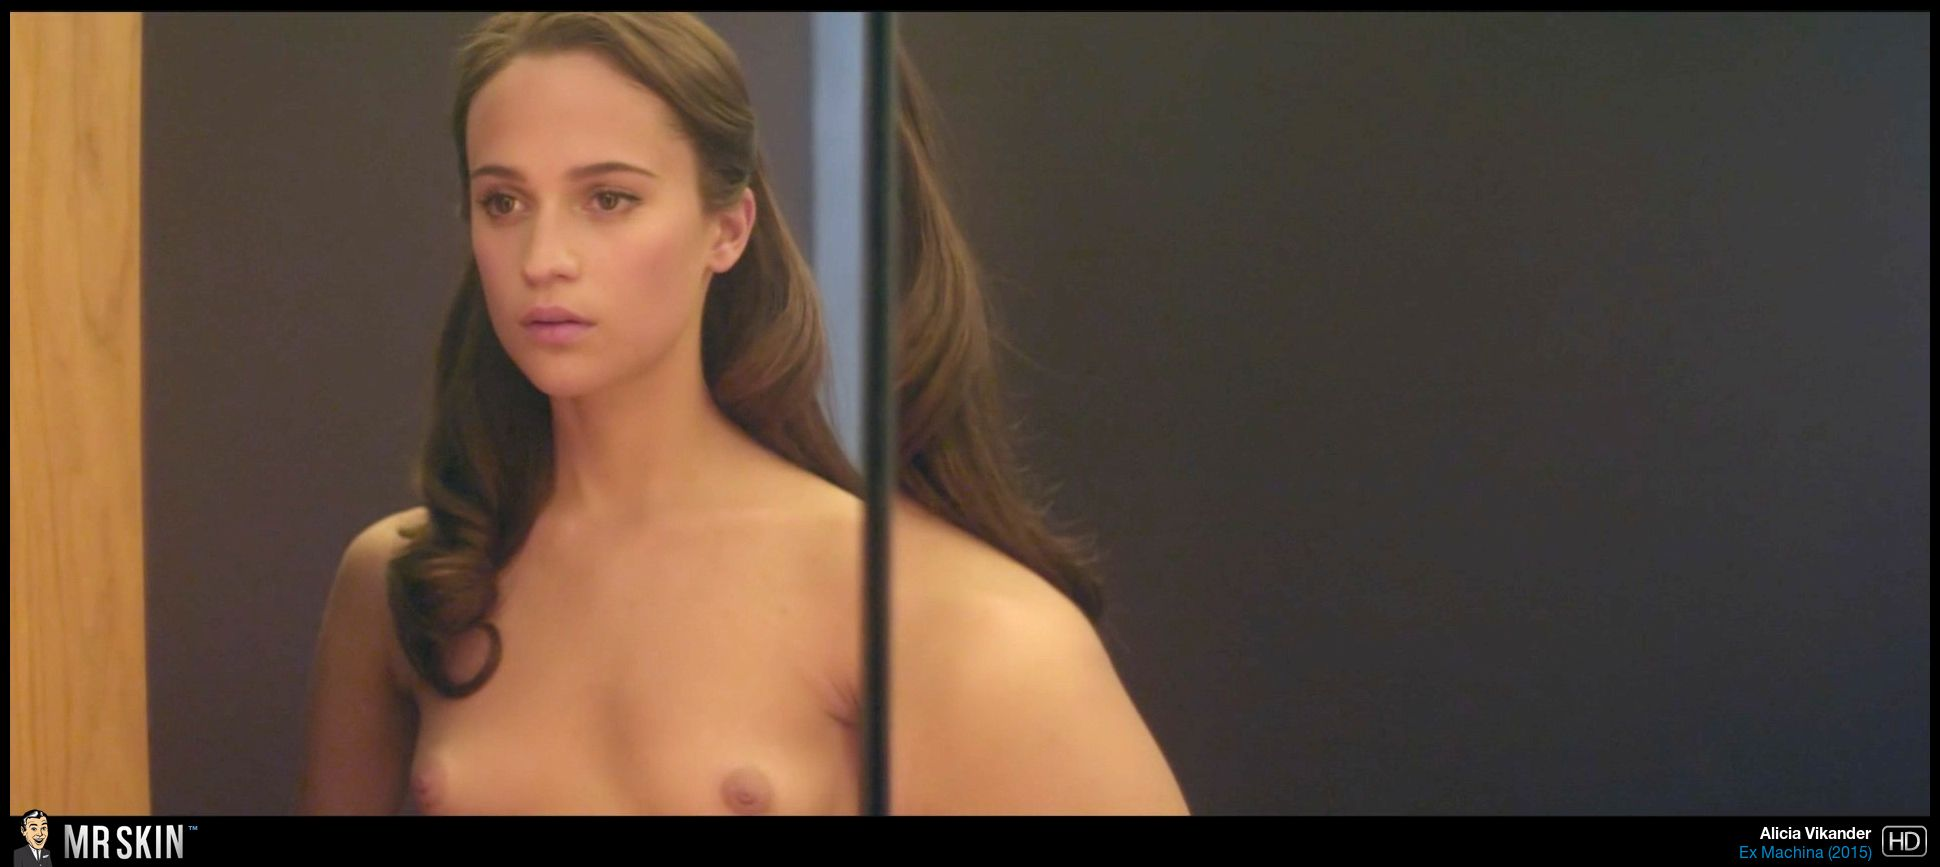 swedish celebrities naked